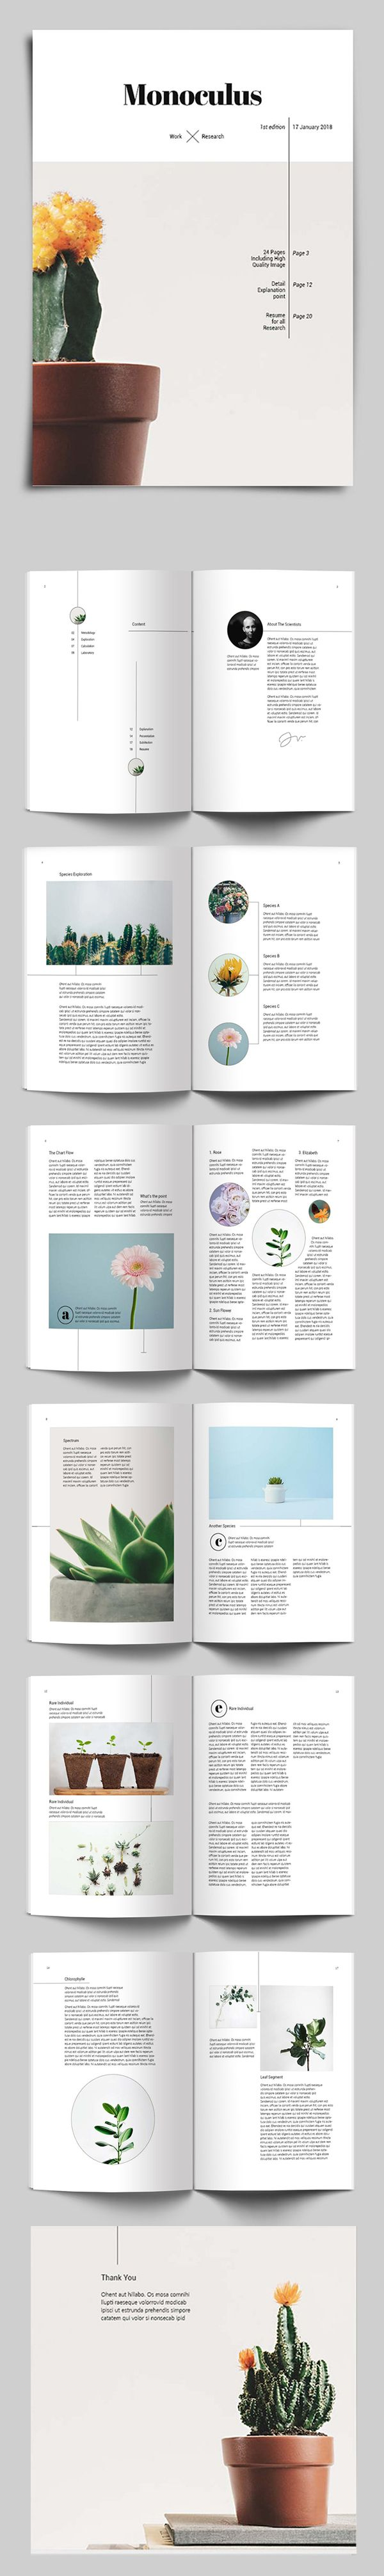 Creative Magazine Style Brochure Template #brochuretemplate #catalogdesign #booklet #annualreport #printdesign #psdtemplate